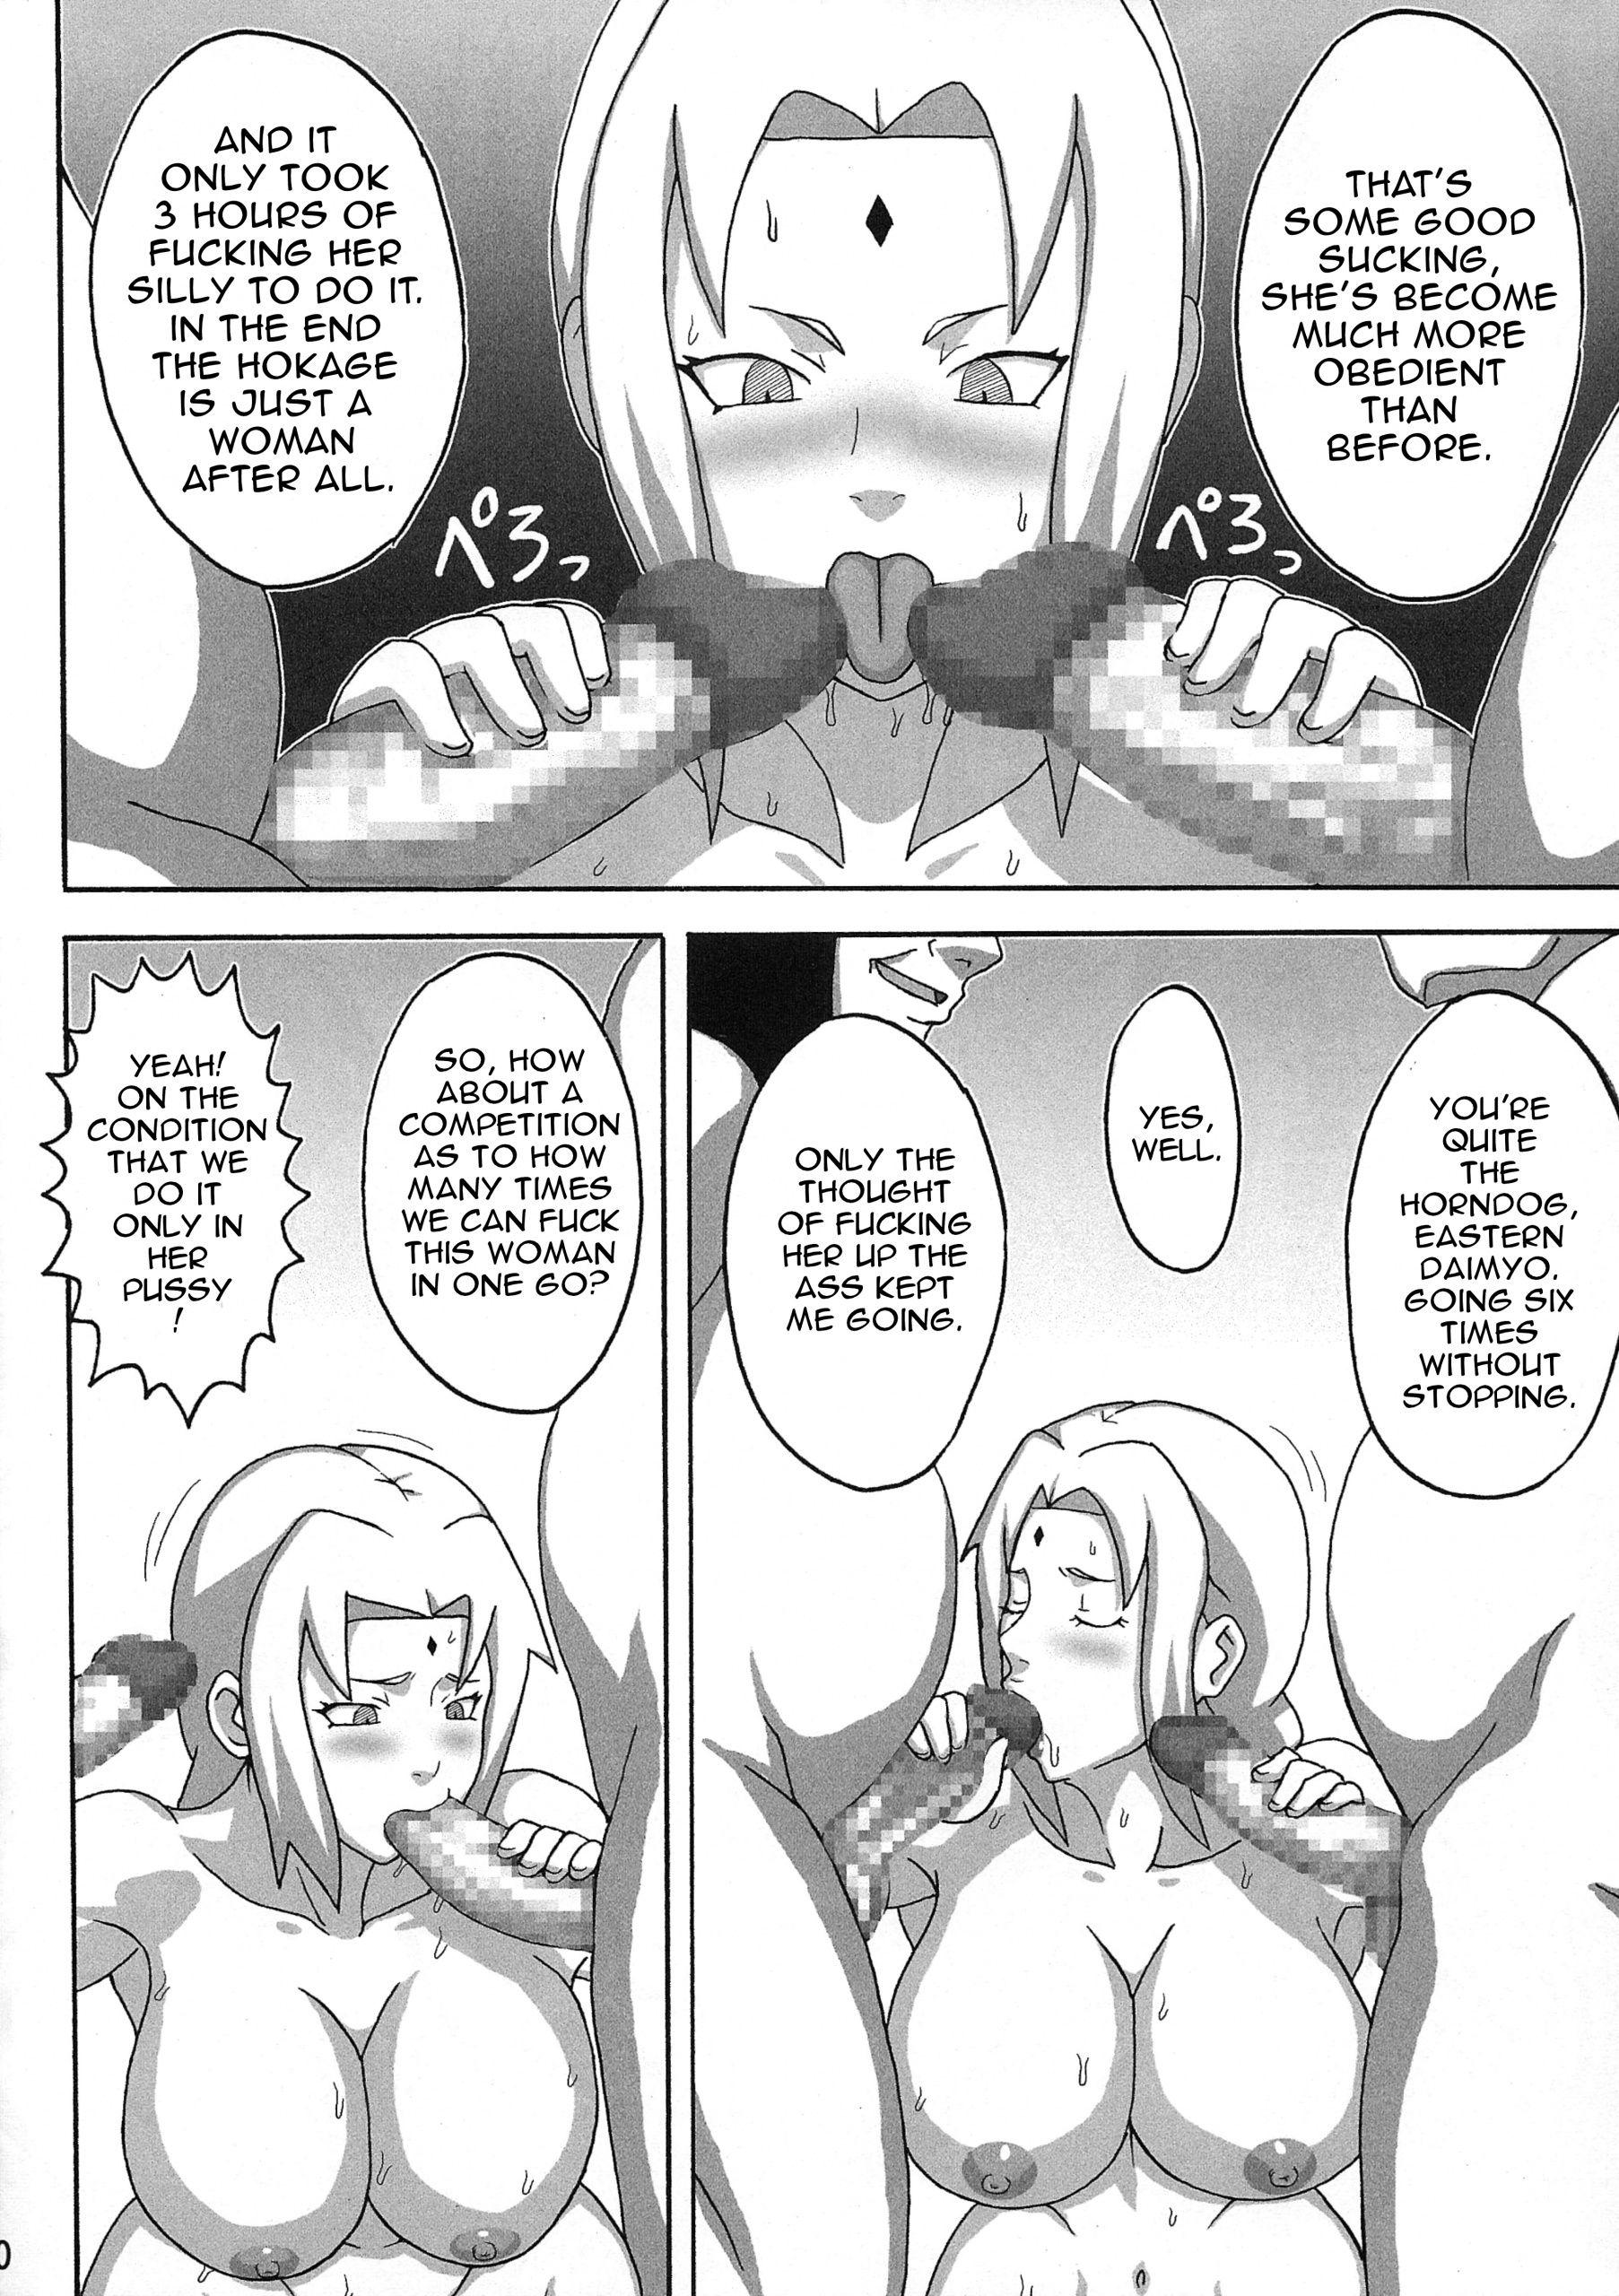 Tsunades lewd reception party hentai manga picture 31